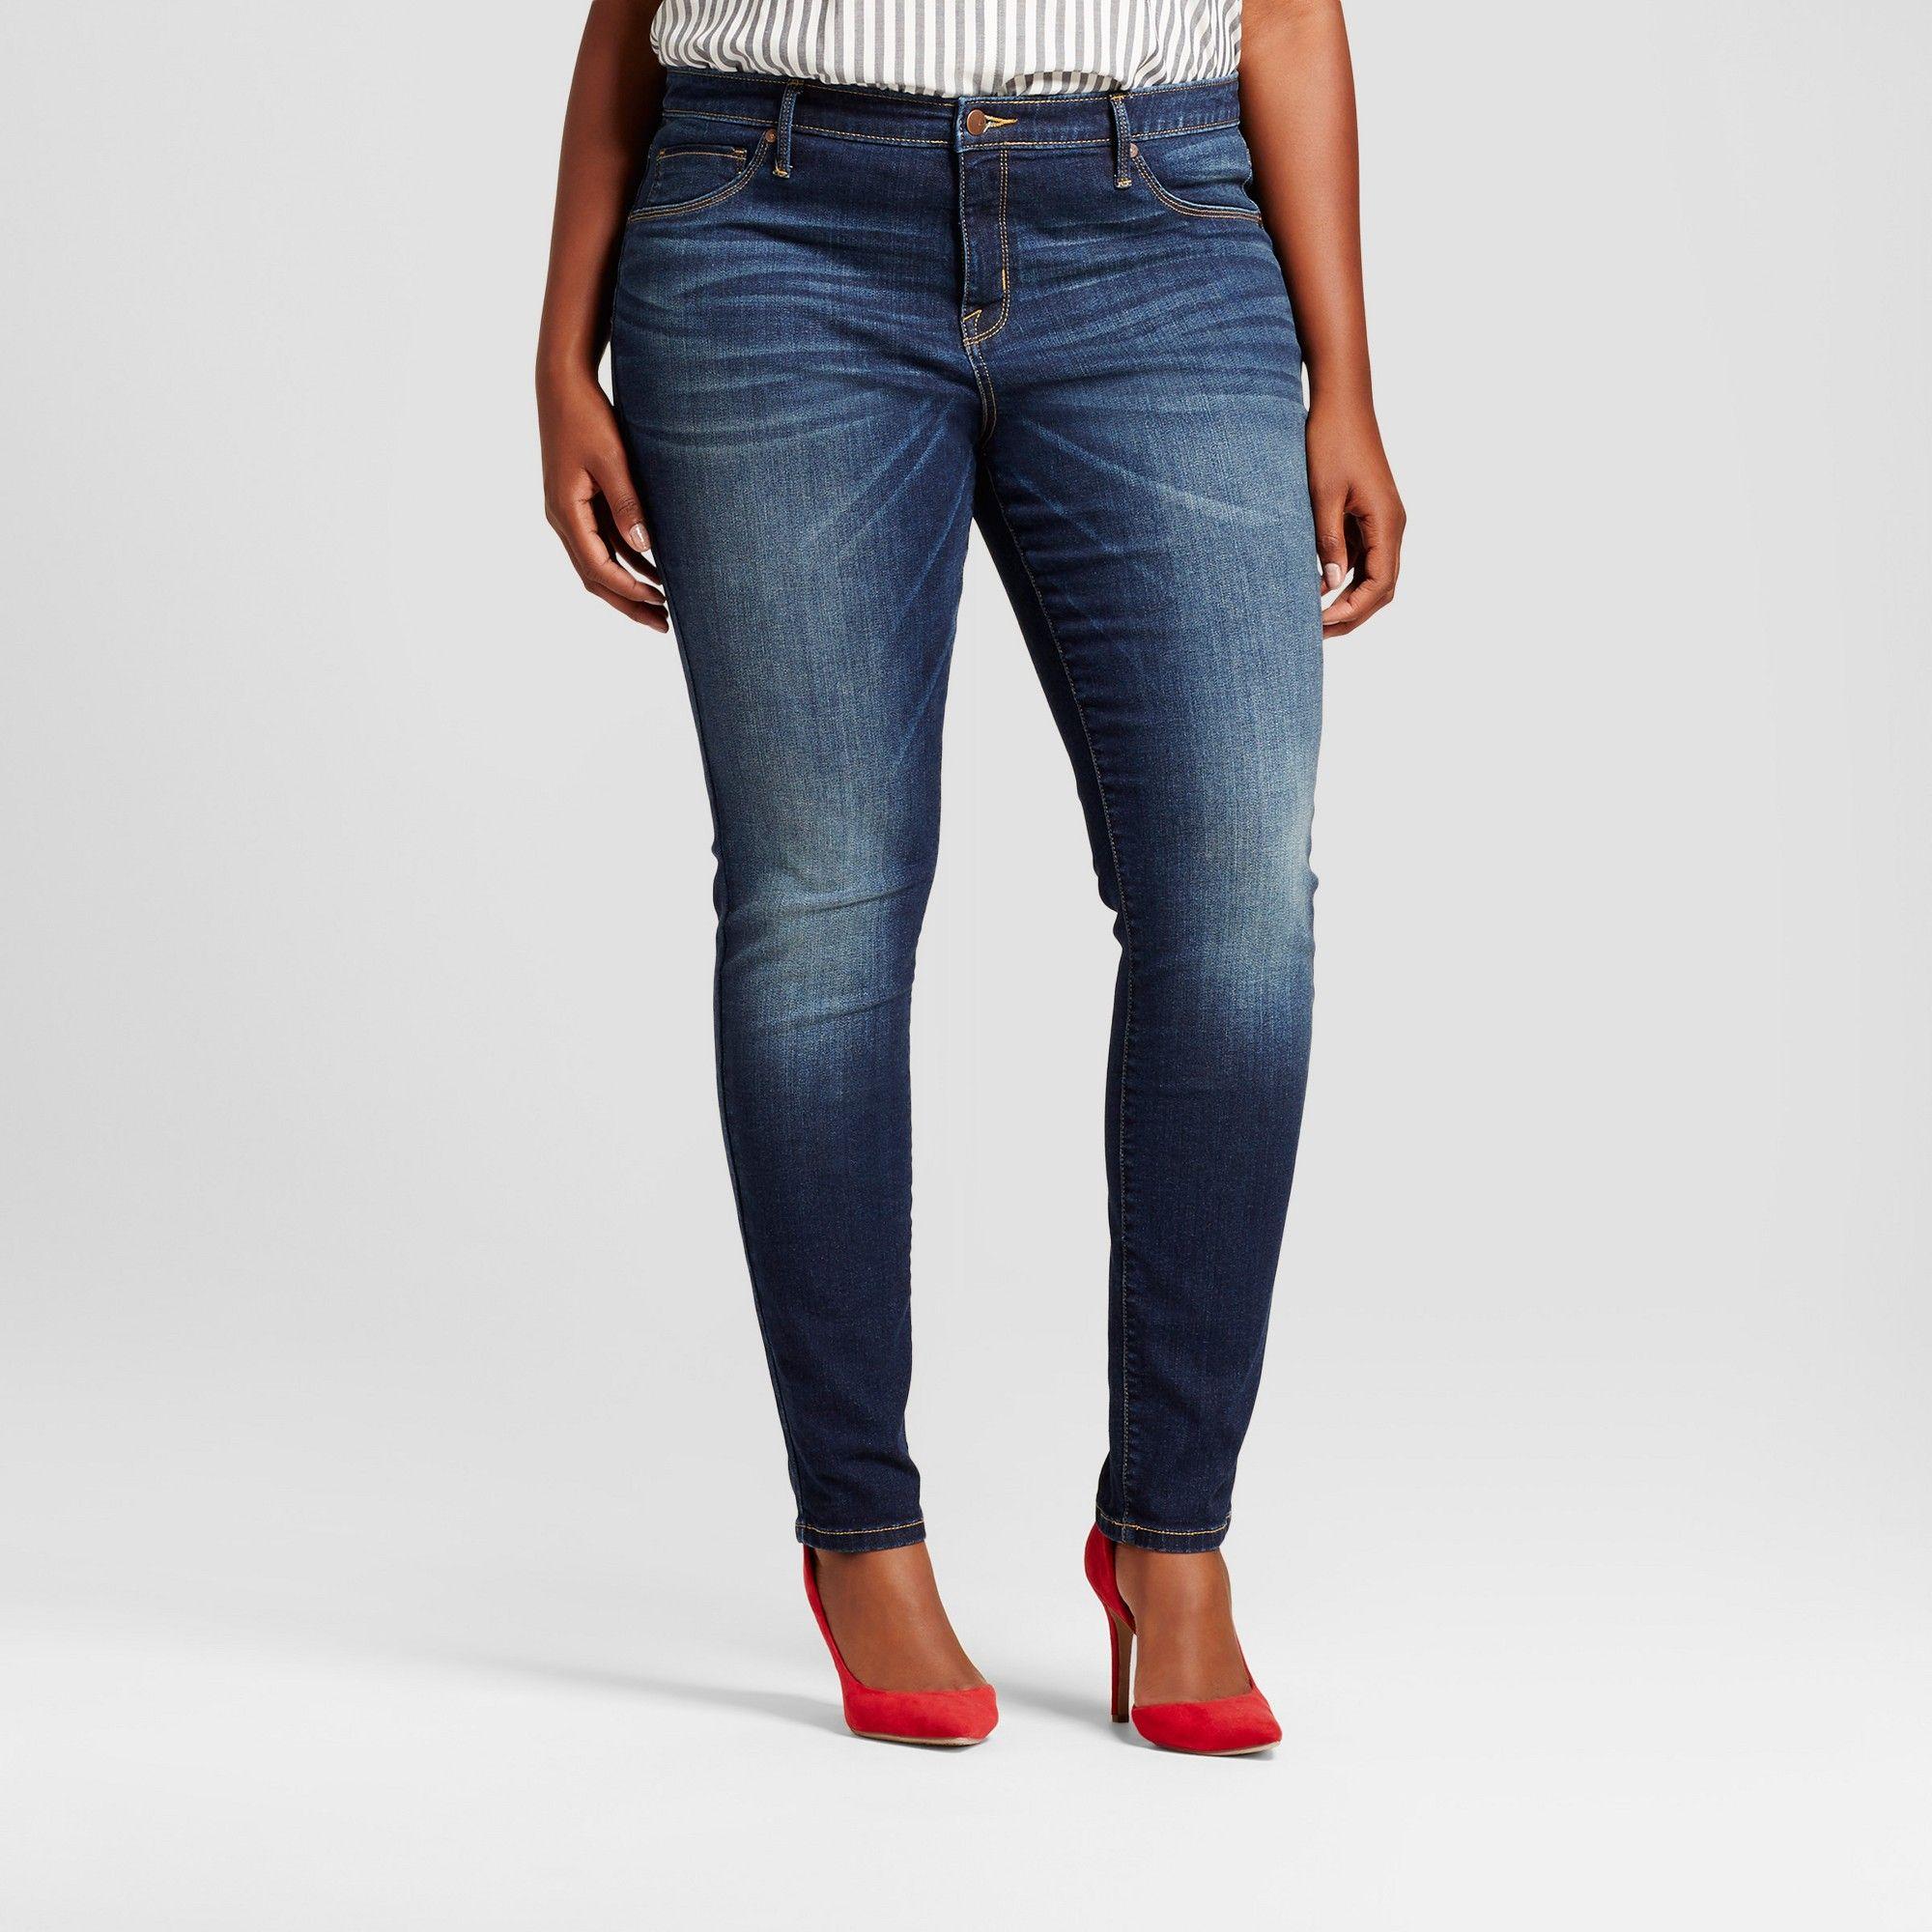 5264f37e6 Women s Plus Size Core Jeggings - Ava   Viv Dark Blue 14WS